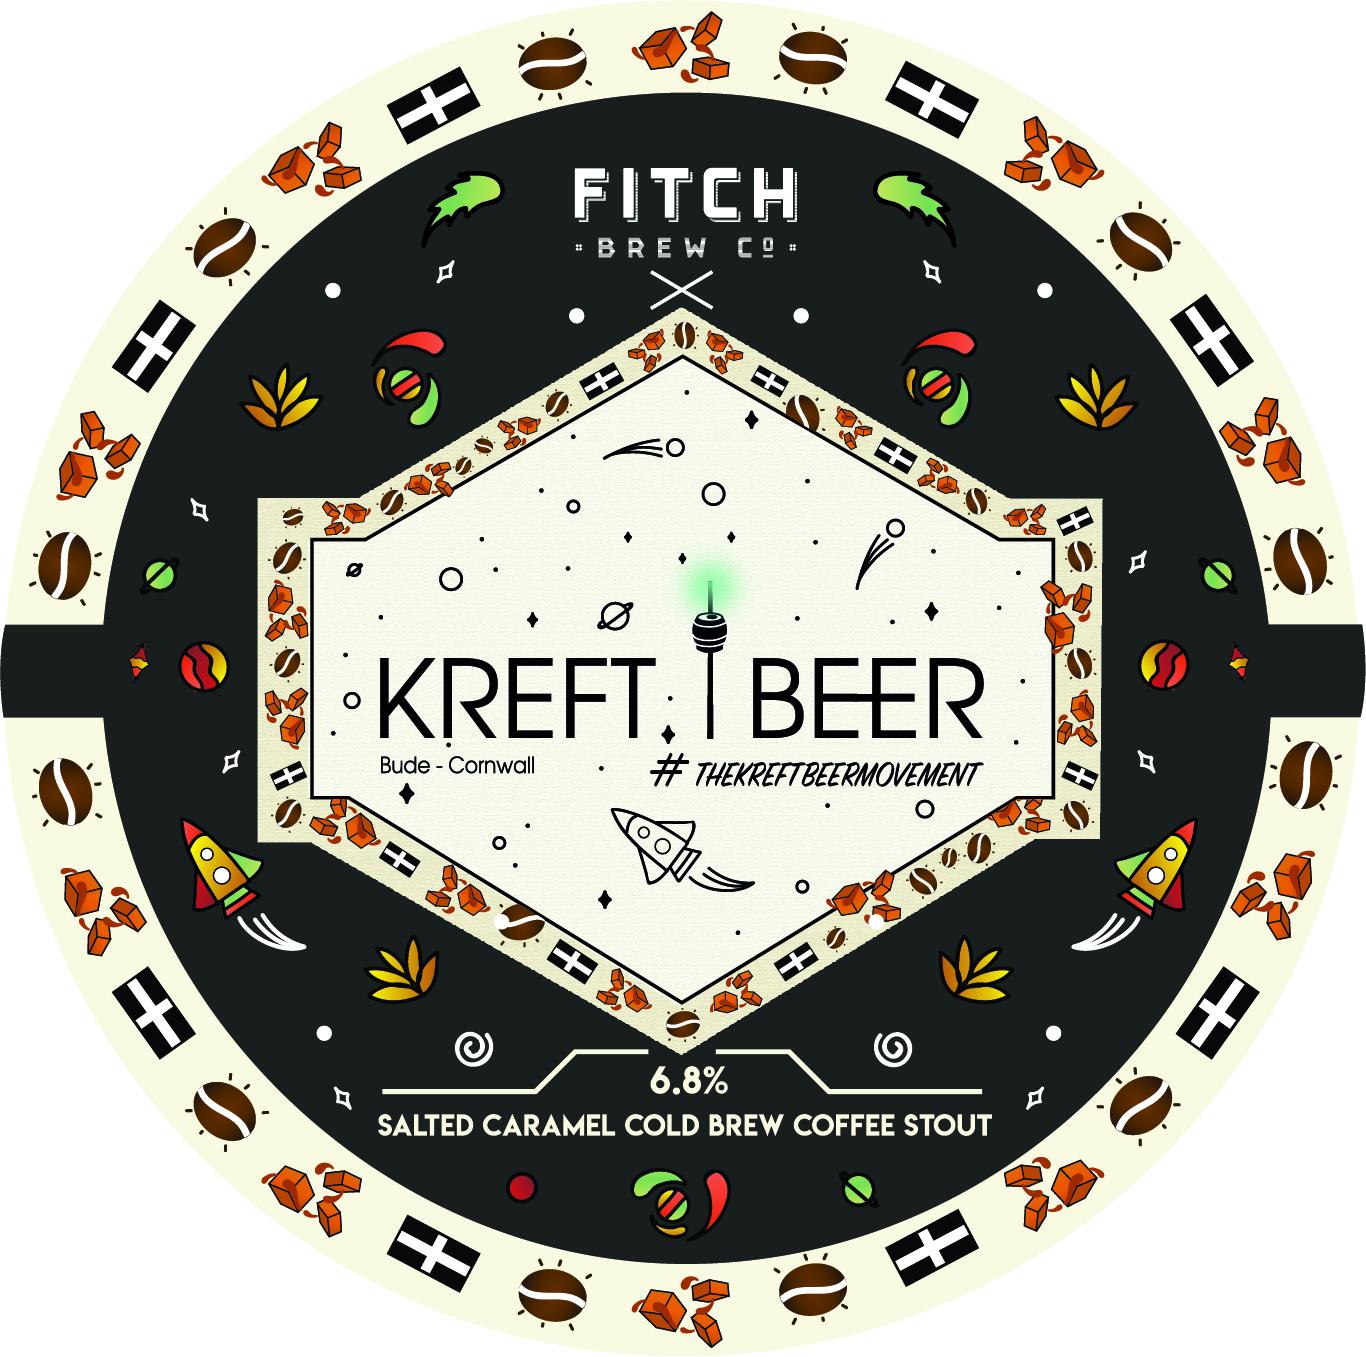 FITCH X KREFT BEER